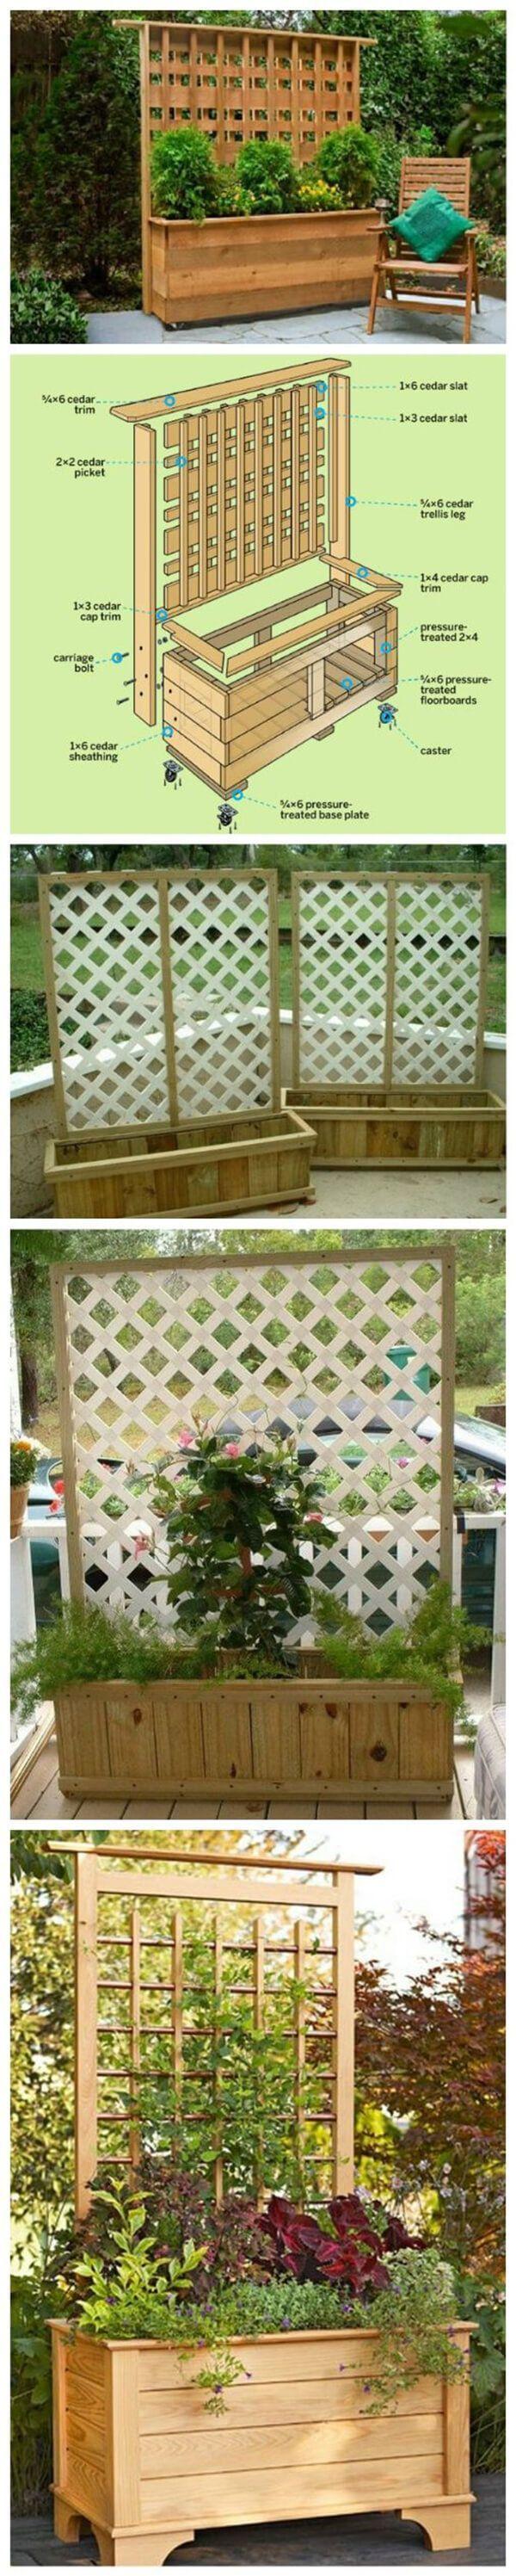 Diy Planter Box With Climbing Trellis Garden Projects 400 x 300